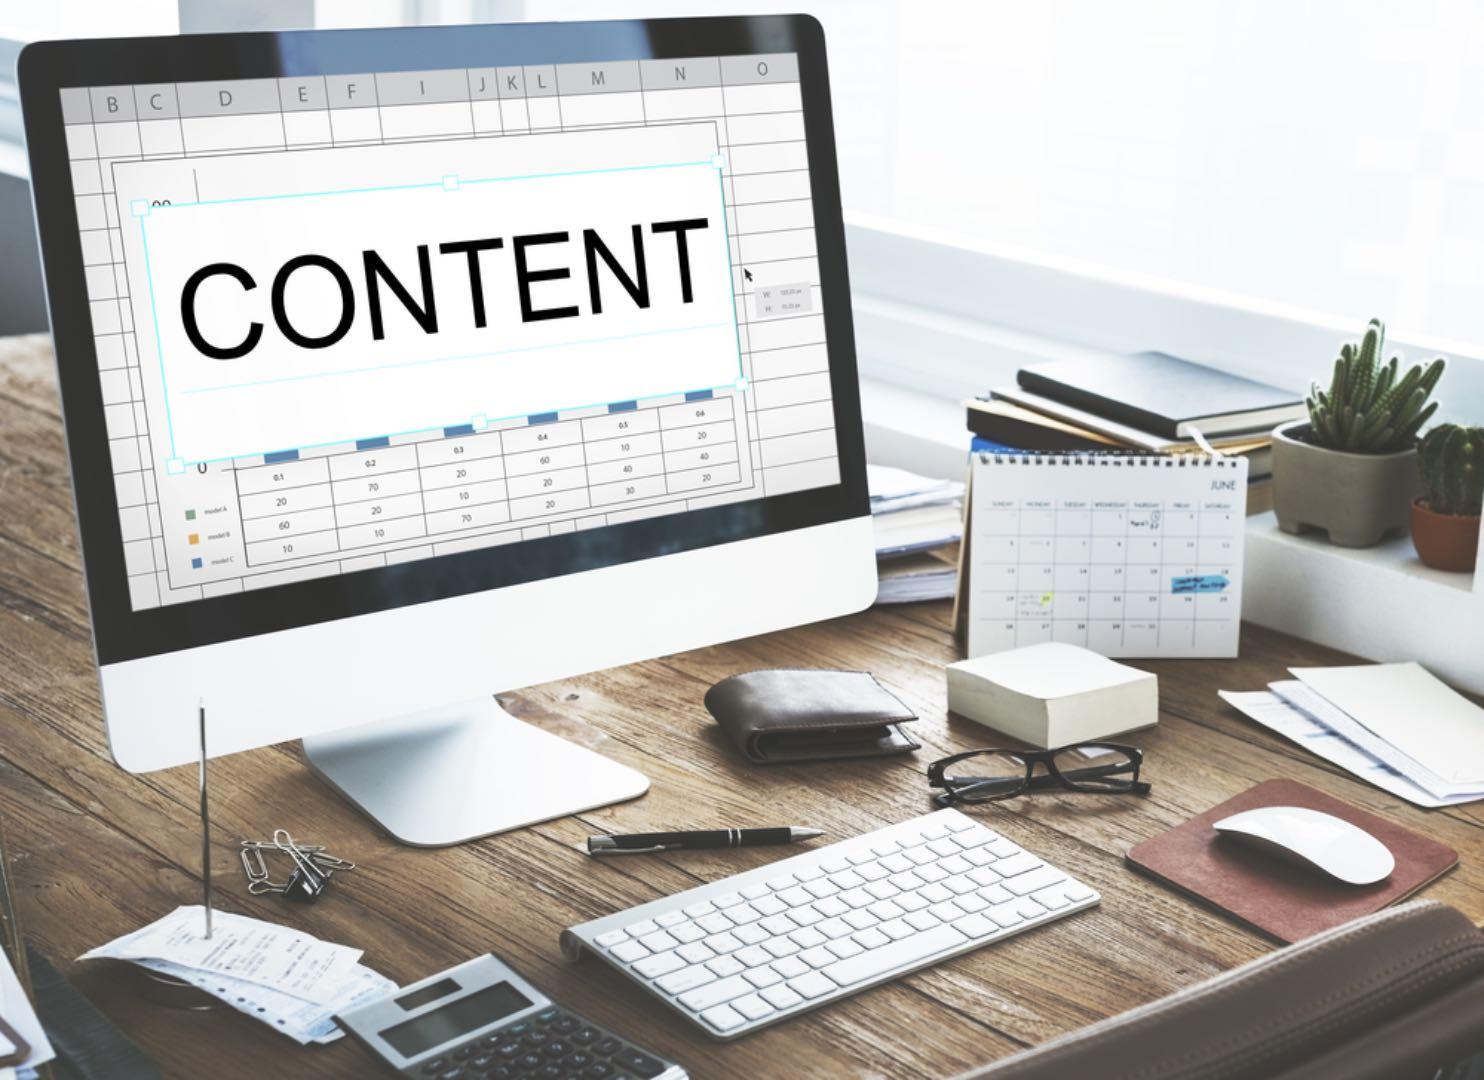 content calendars are vital for successful content marketing campaigns